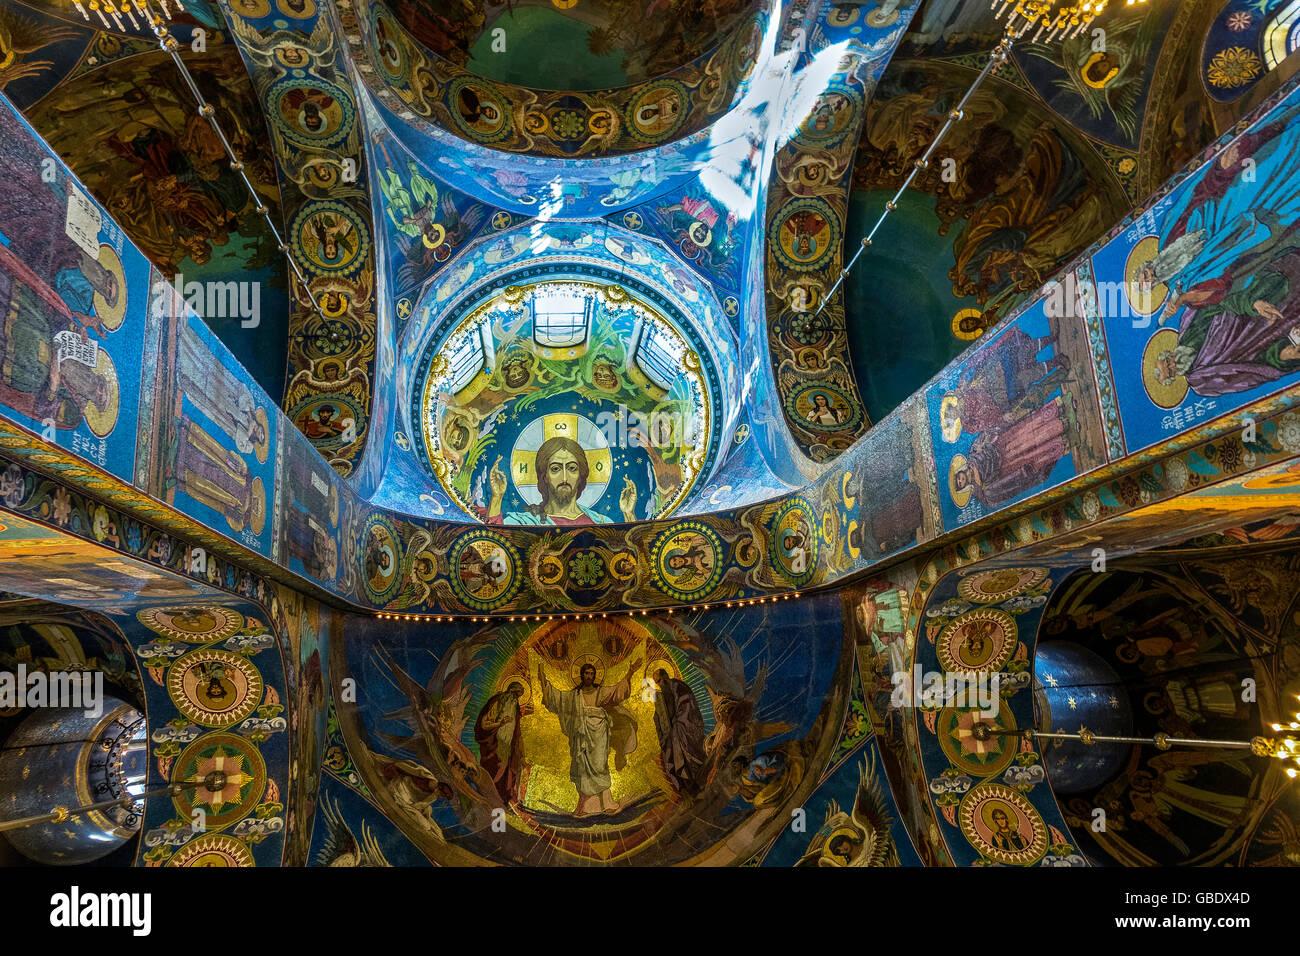 Iglesia de la sangre derramada en San Petersburgo en Rusia Imagen De Stock